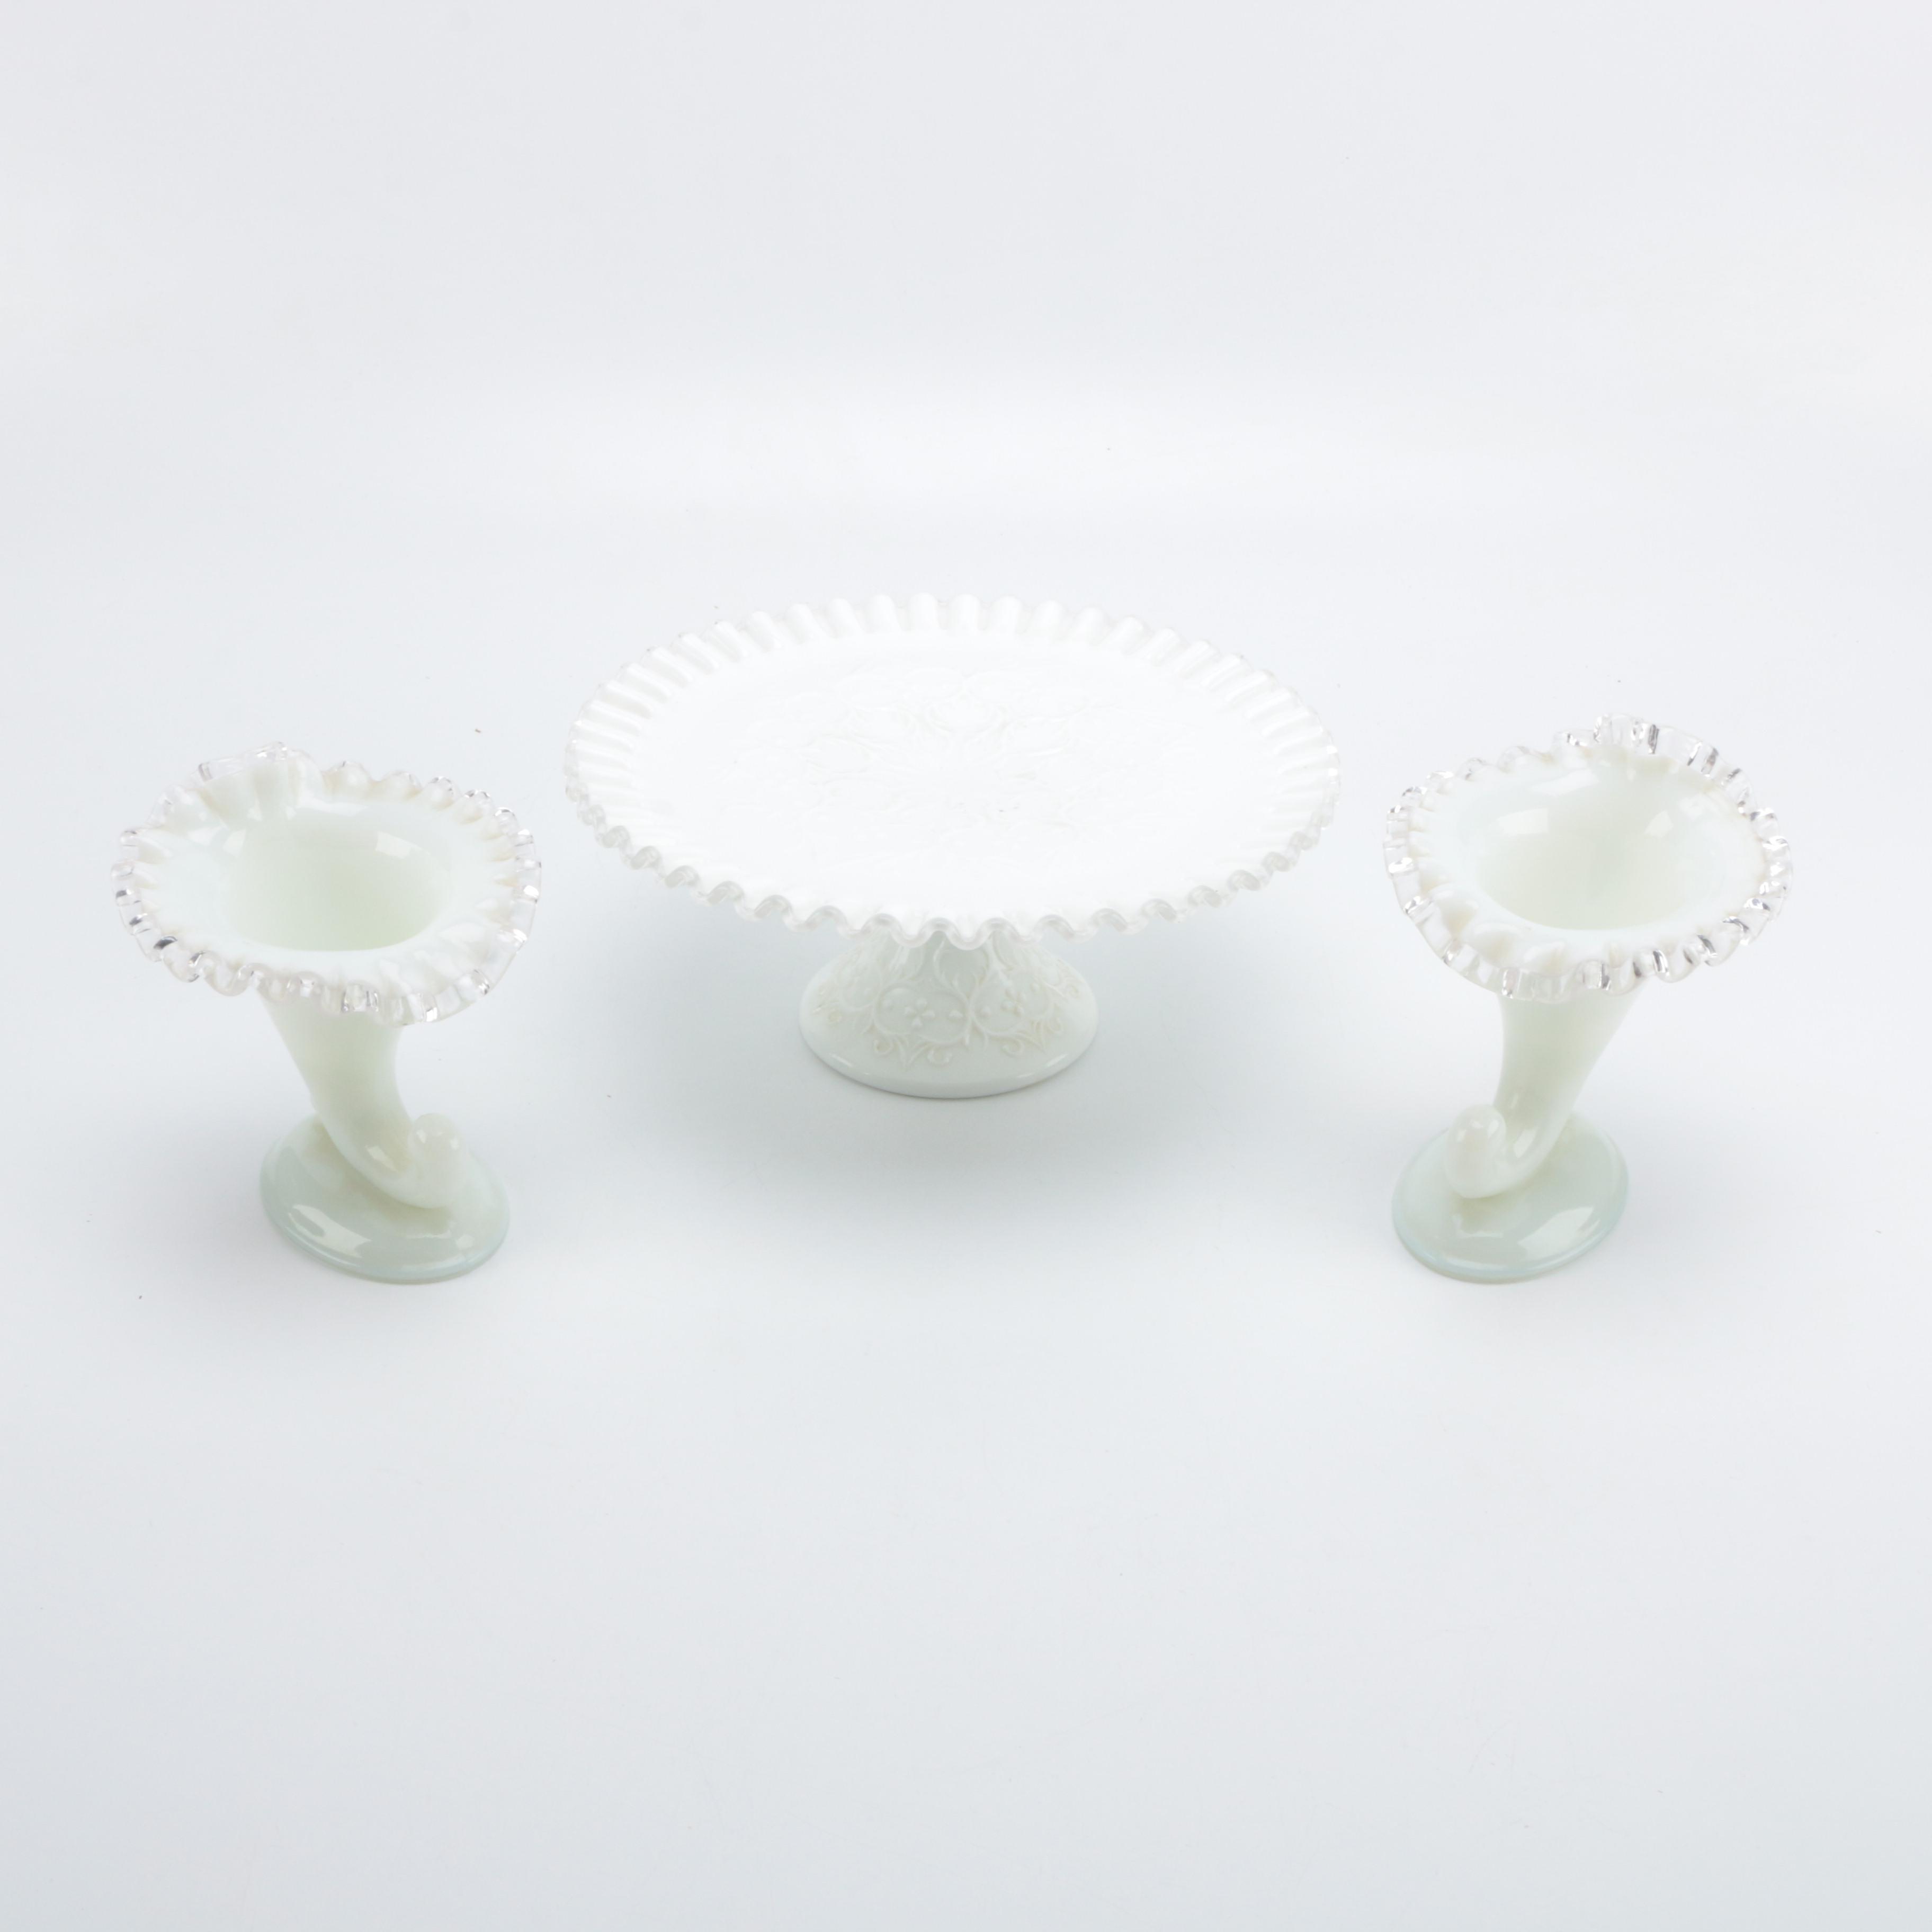 Vintage Milk Glass Assortment